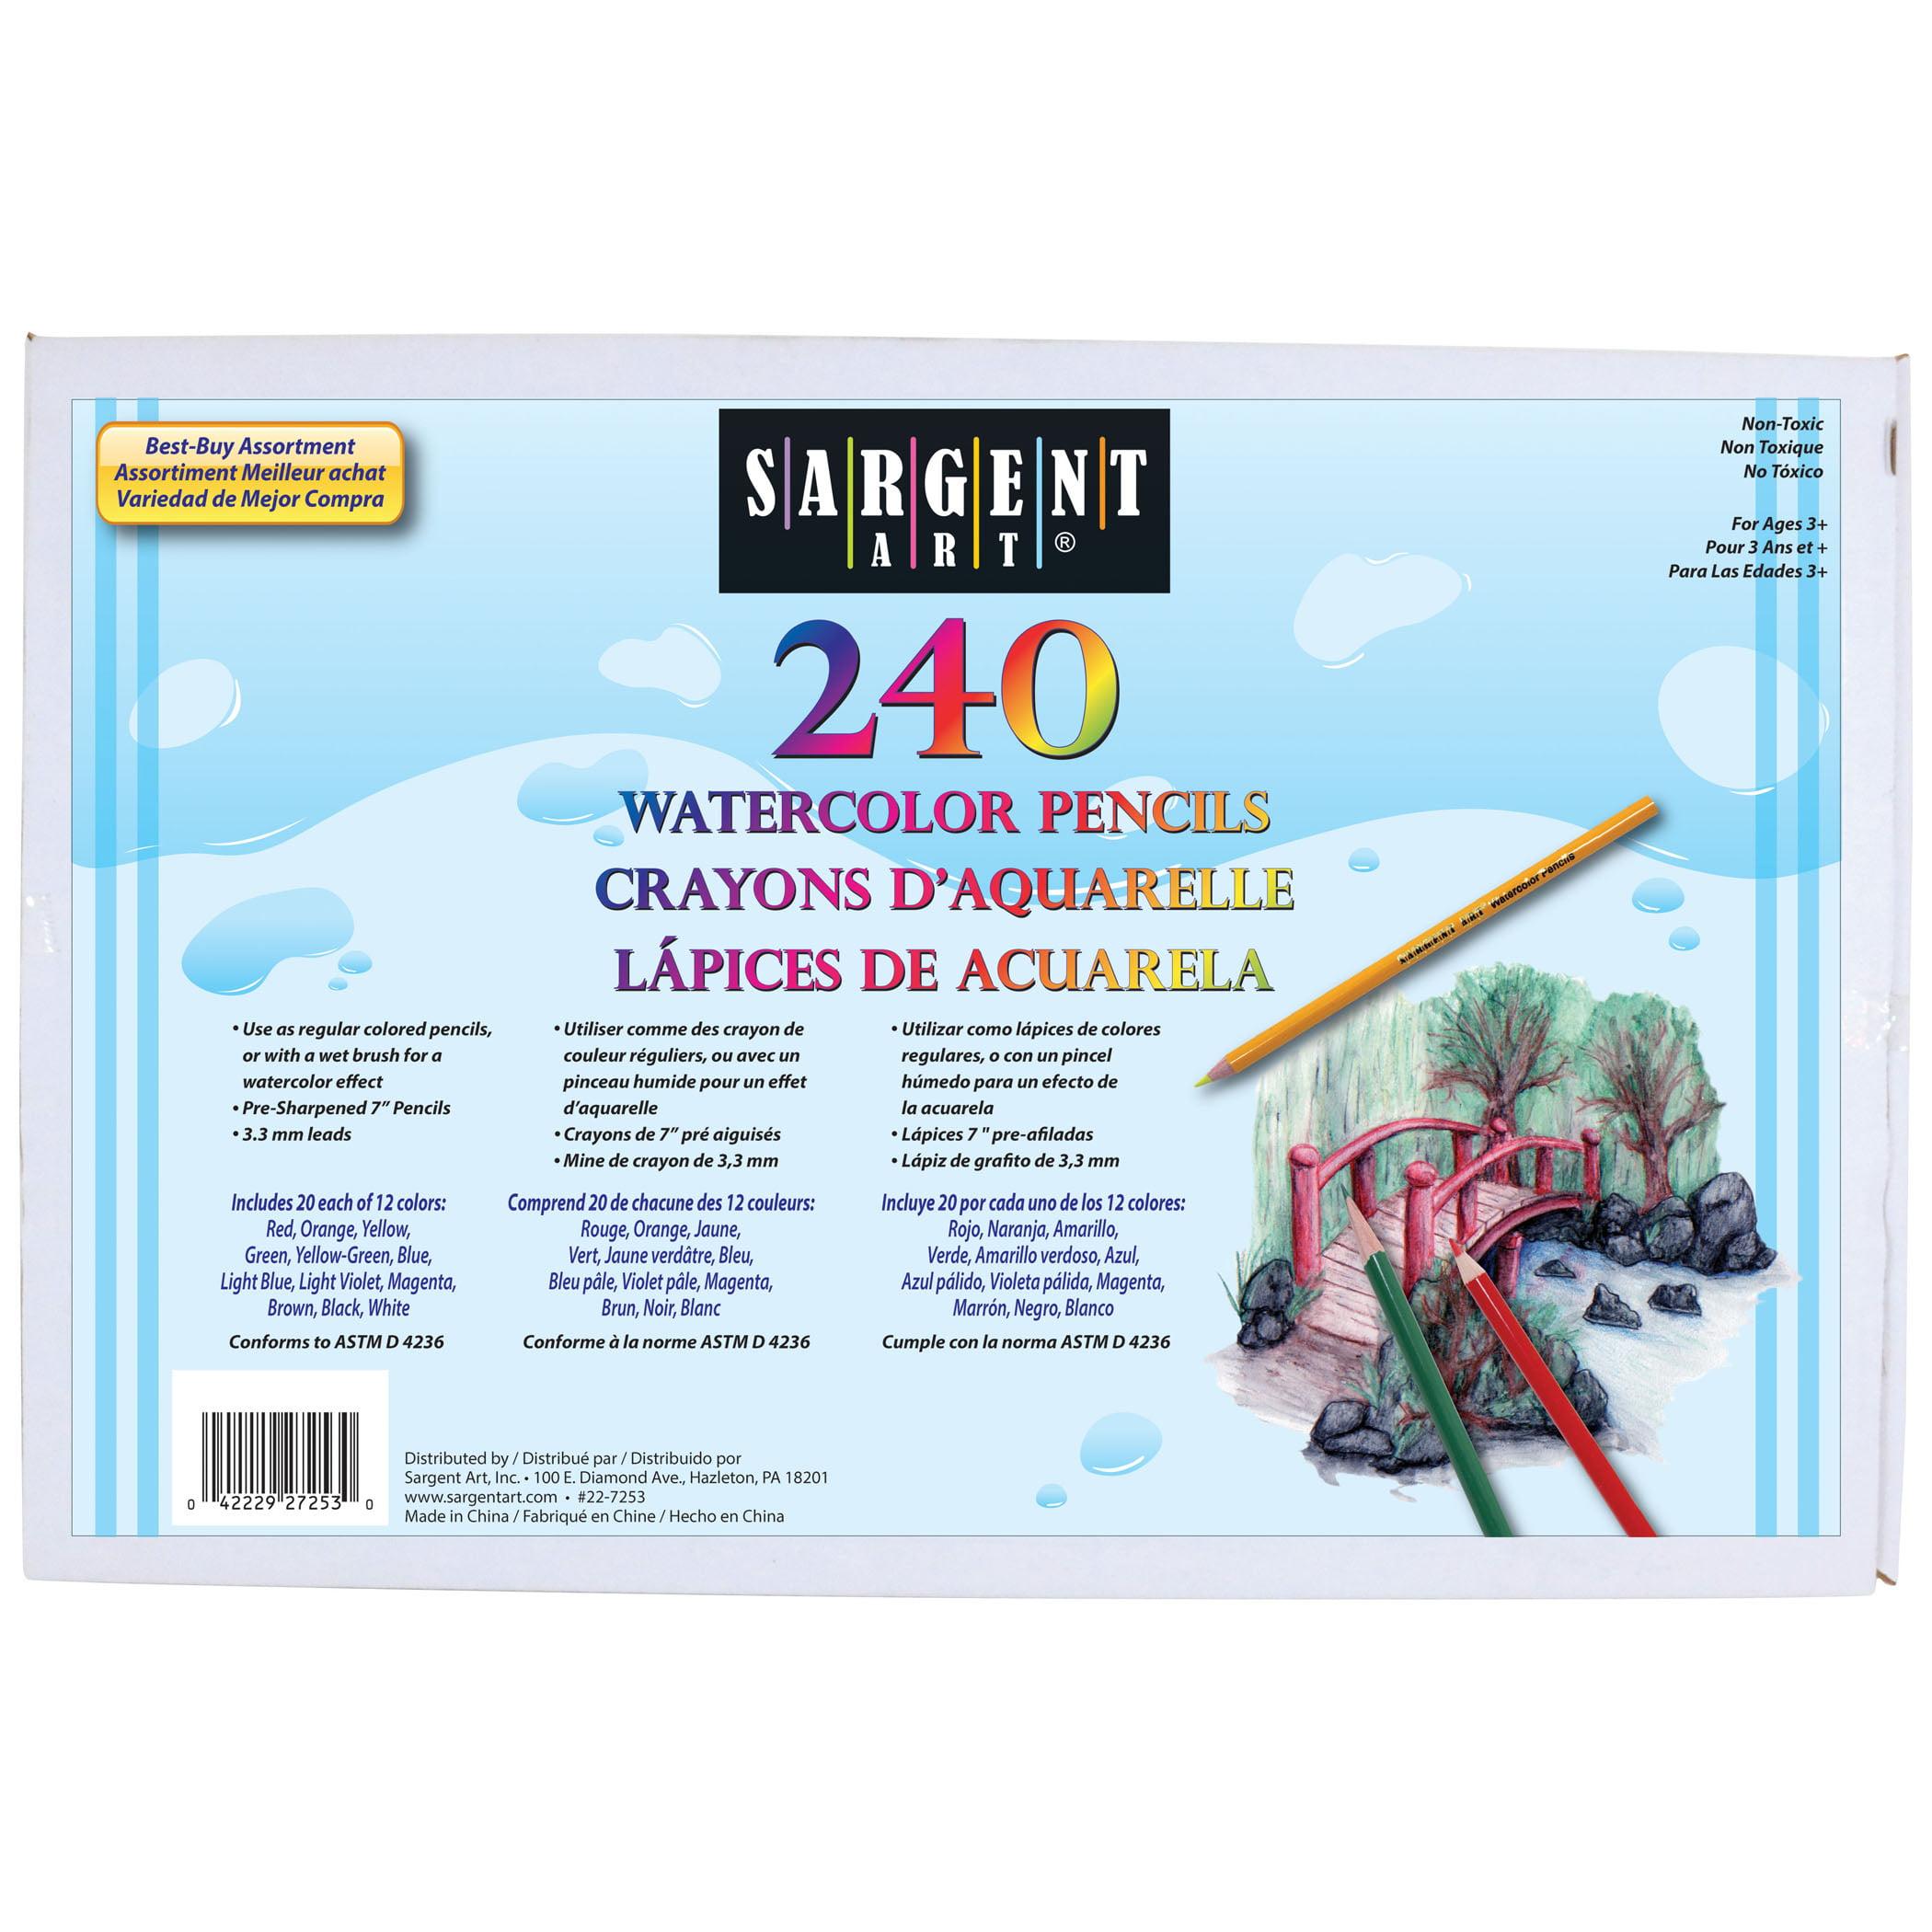 Sargent Art® Best-Buy Colored Pencil Assortment, 240 ct